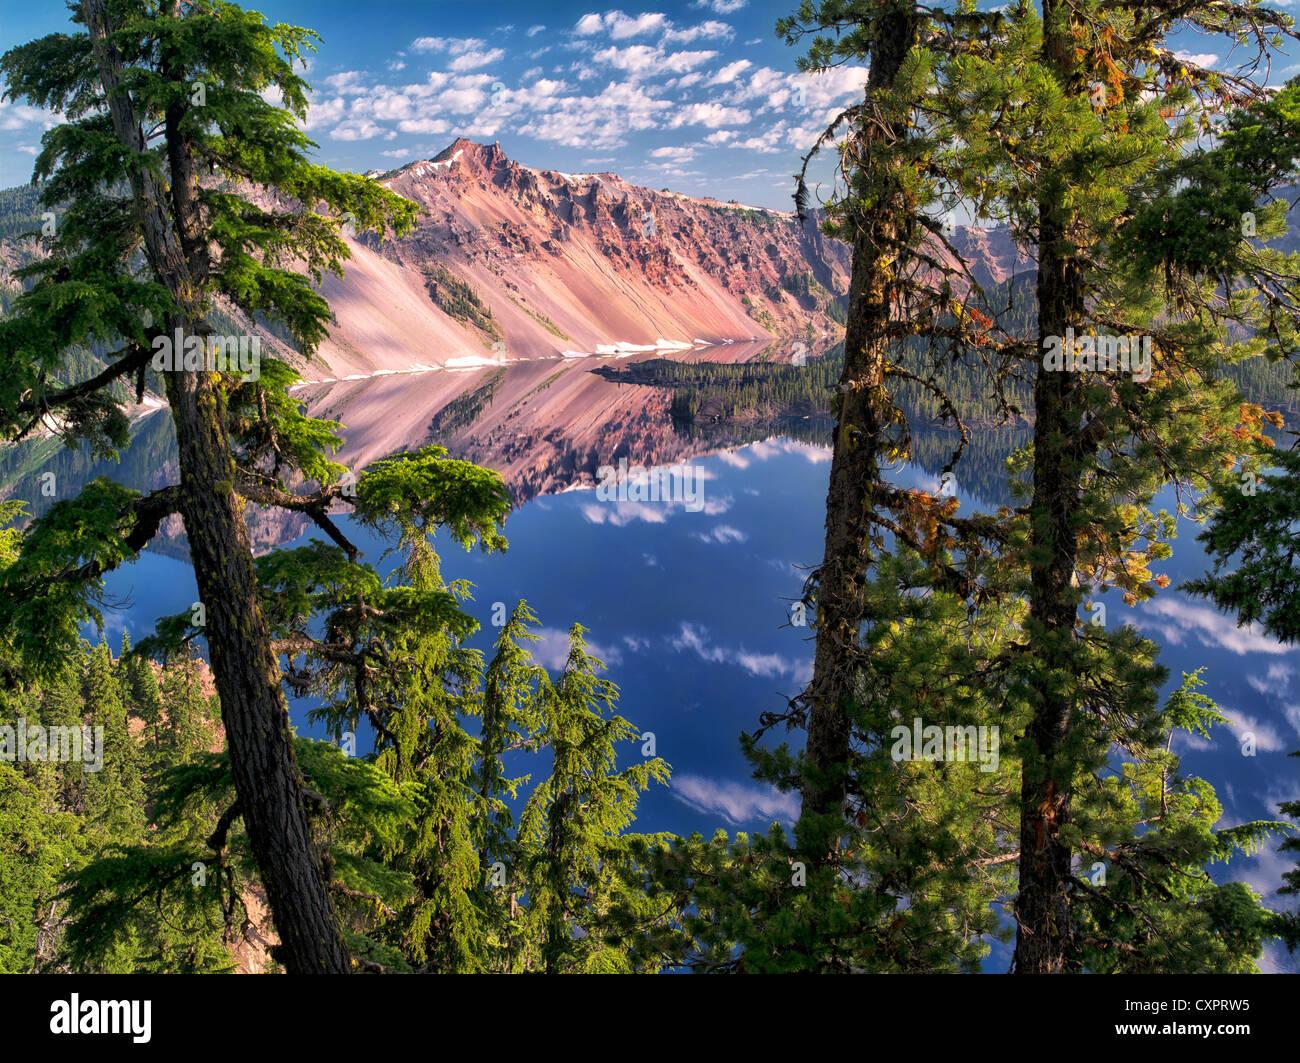 Kratersee Reflexion und The Watchman Peak. Crater Lake Nationalpark, Oregon Stockbild